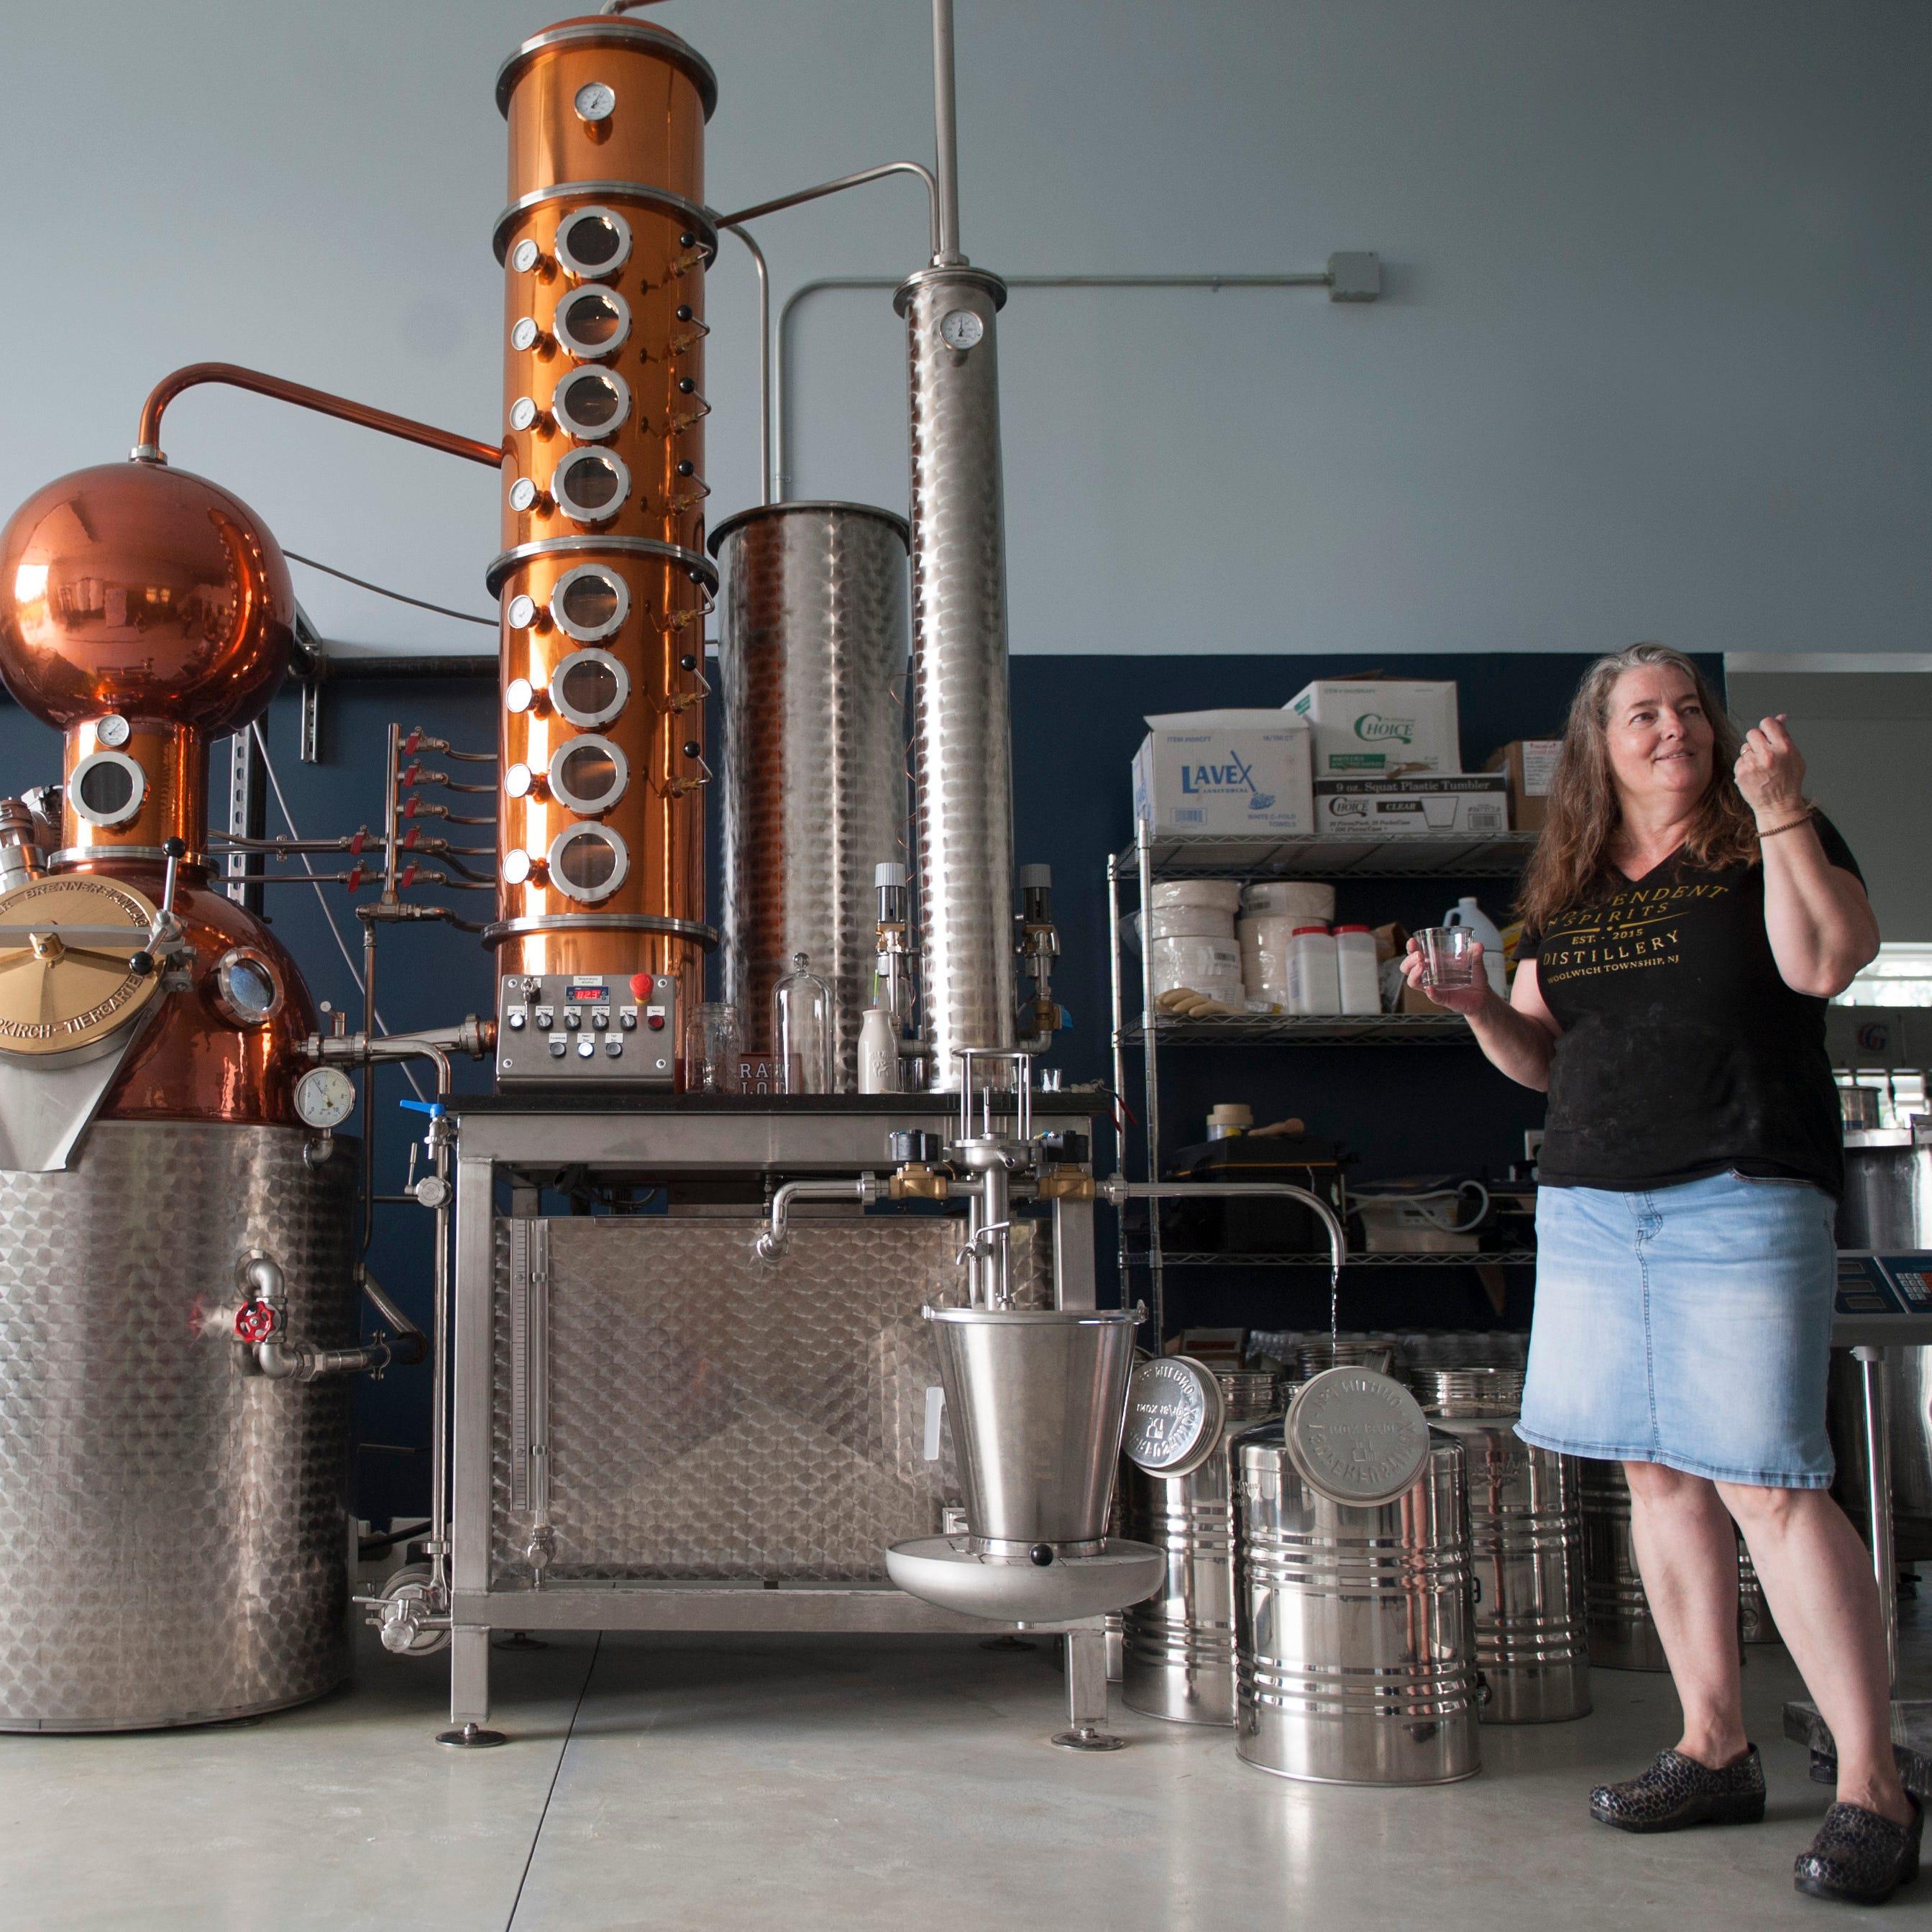 Hoochie mama goals: 'Grow old filling whiskey barrels'